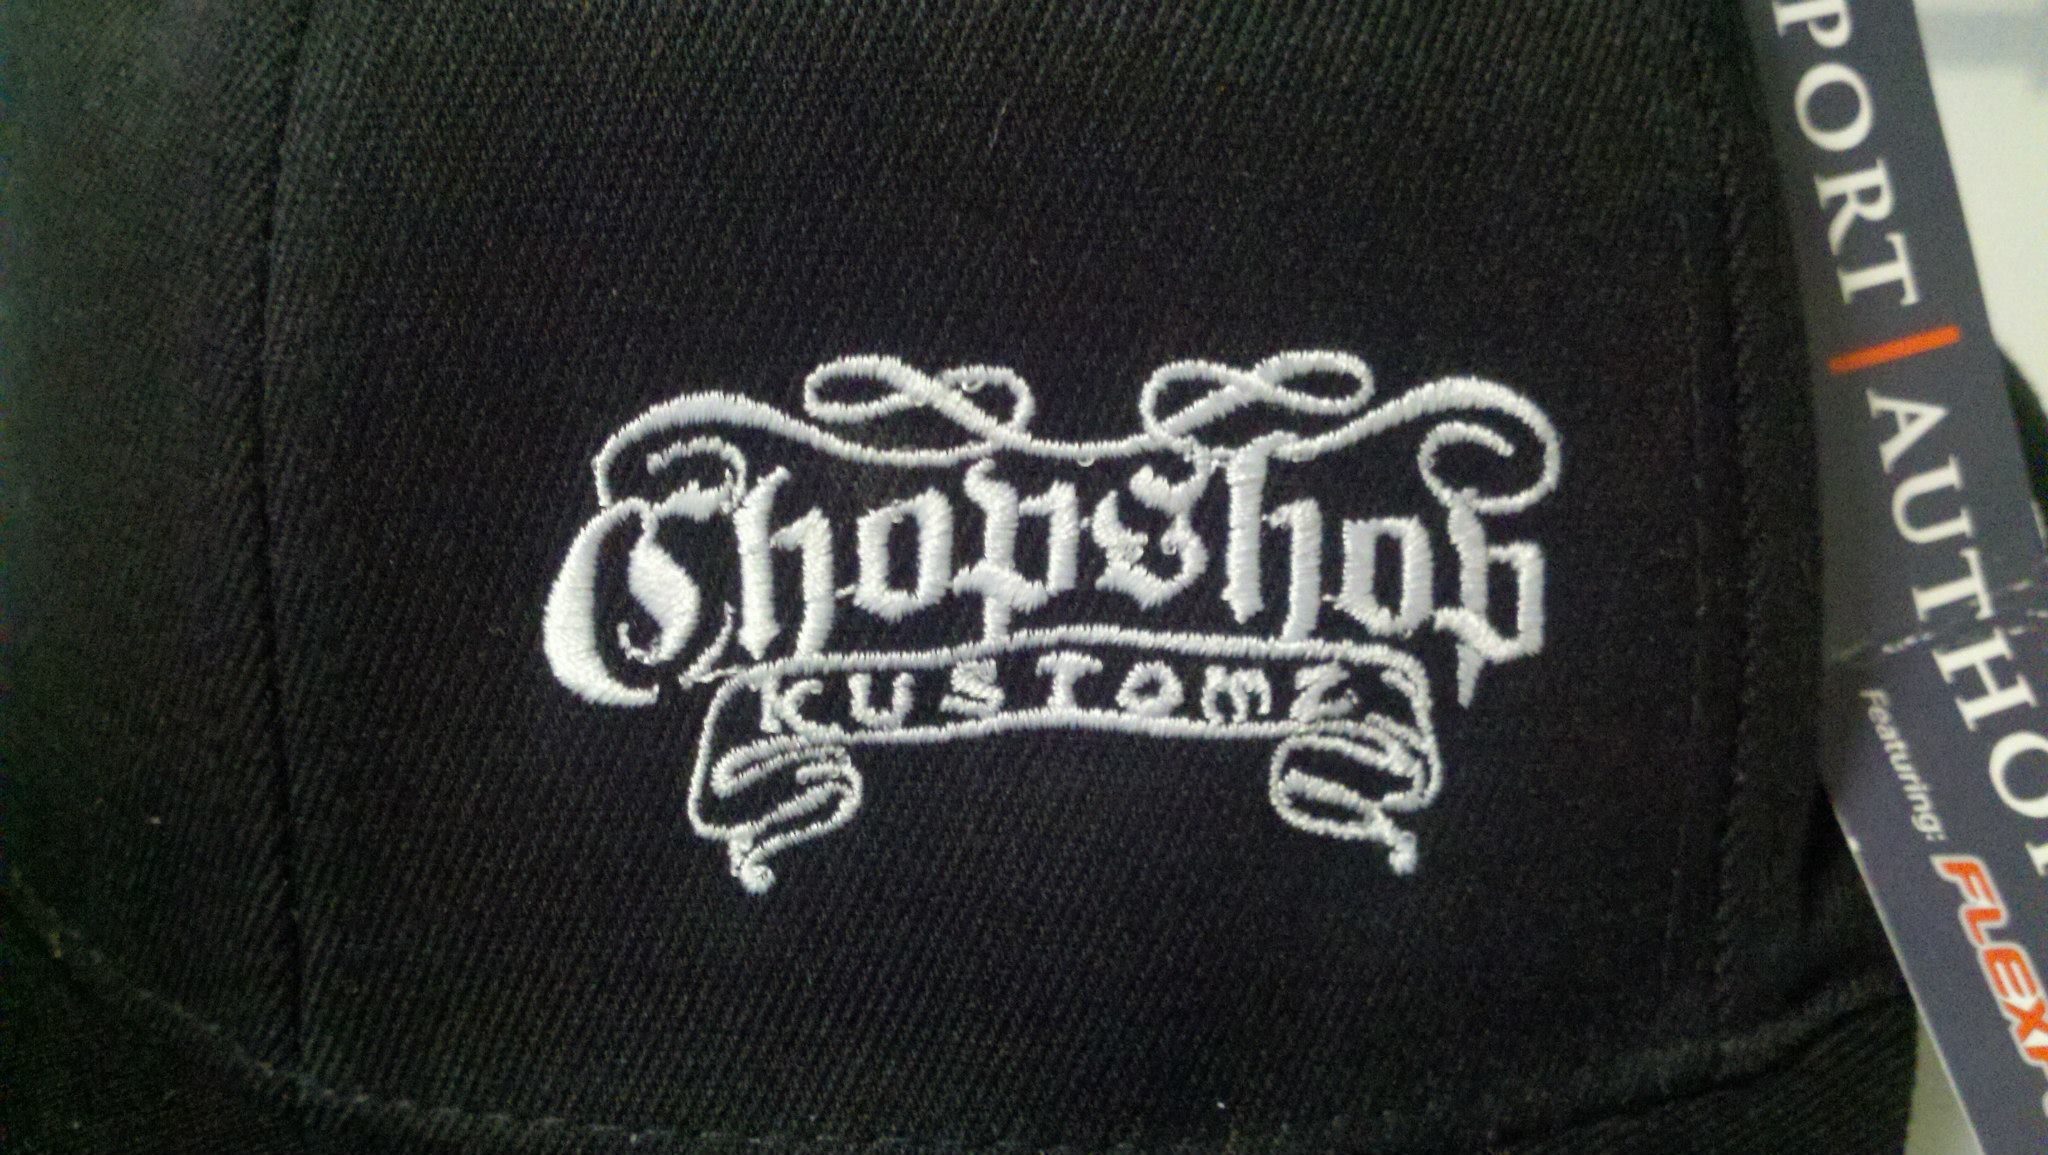 Chop Shop Customz